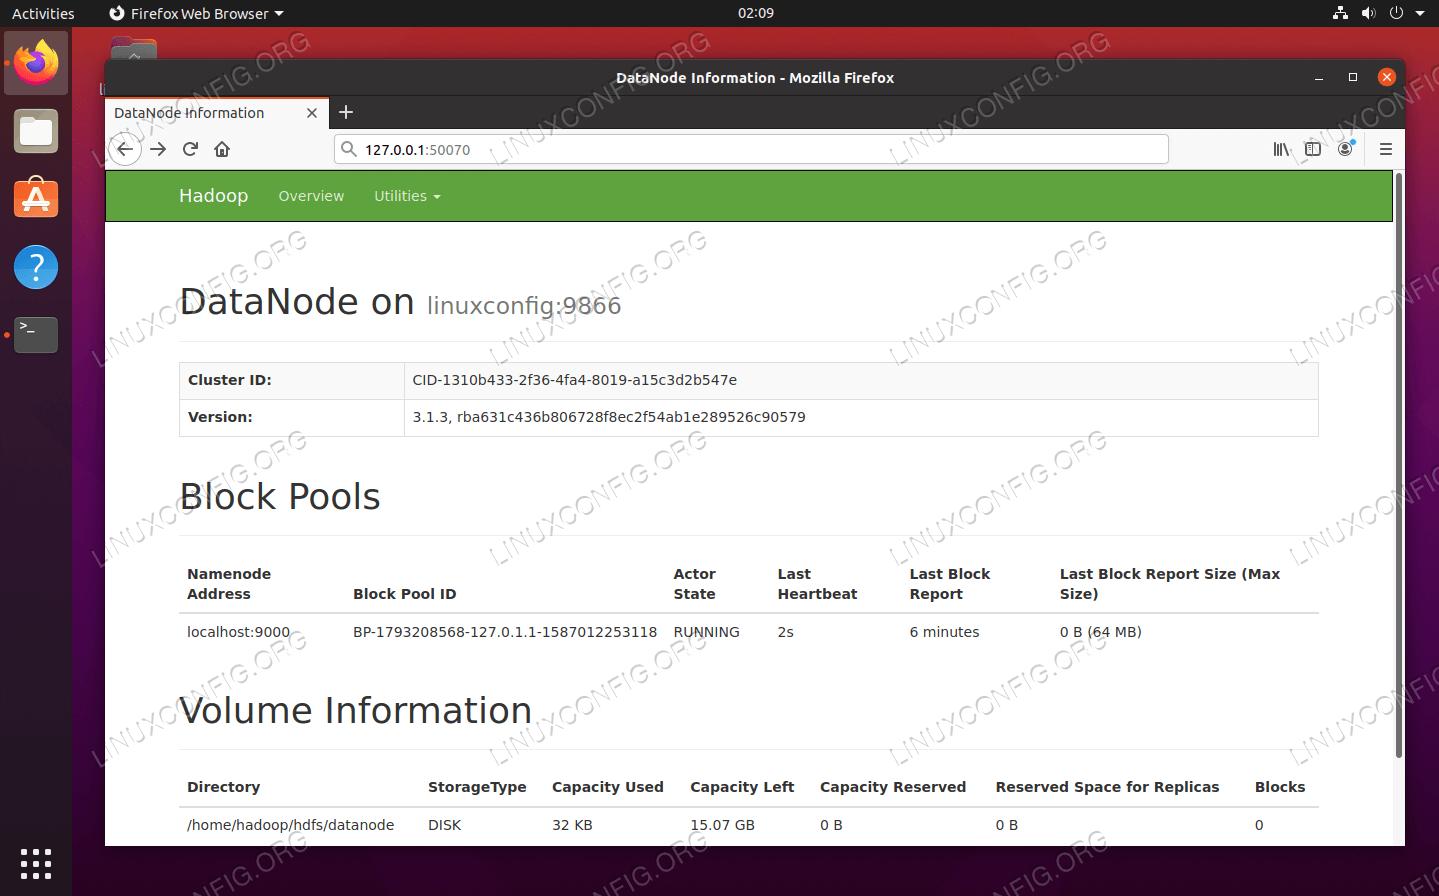 DataNode web interface for Hadoop